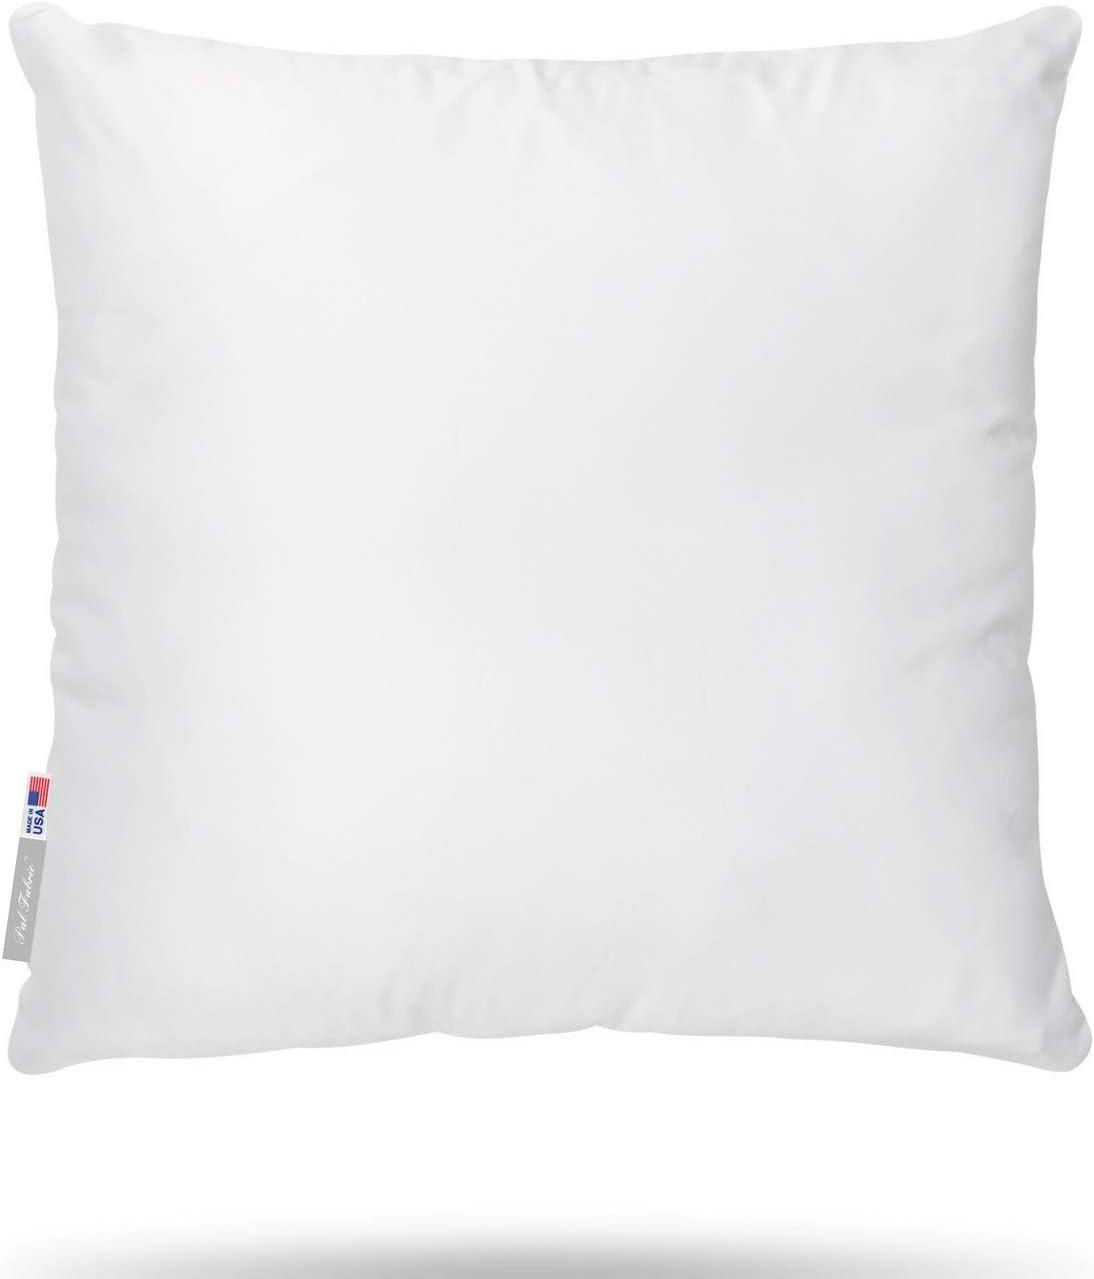 Pal Fabric PLN2222 Square Decorative Sofa Throw Pillow Insert 22